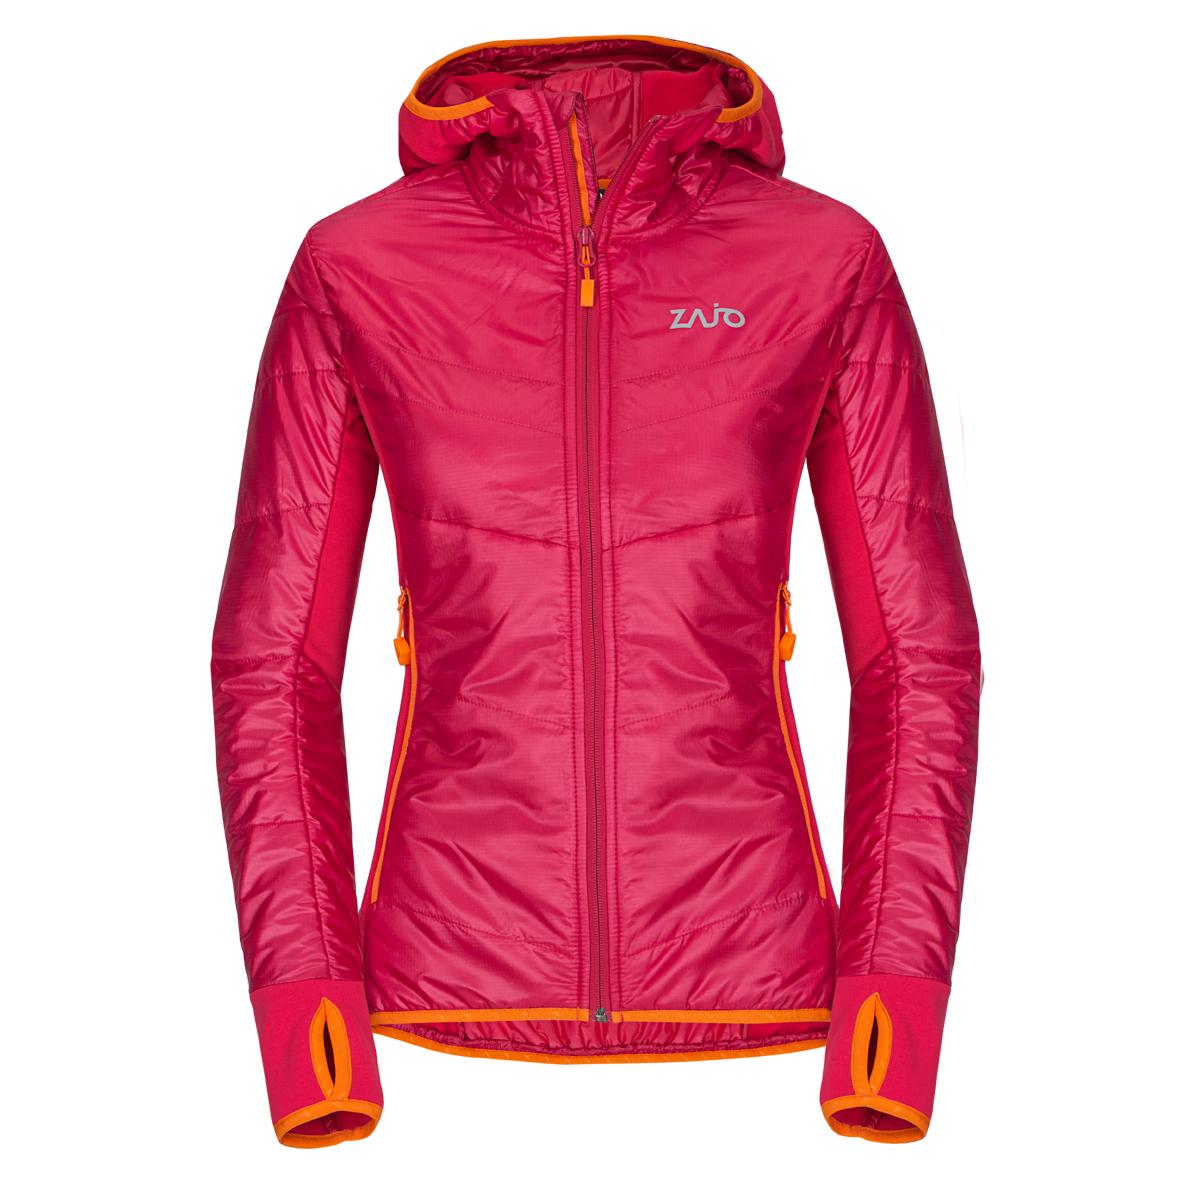 Dámska bunda Zajo Rossa W JKT Jazzy - veľkosť XS